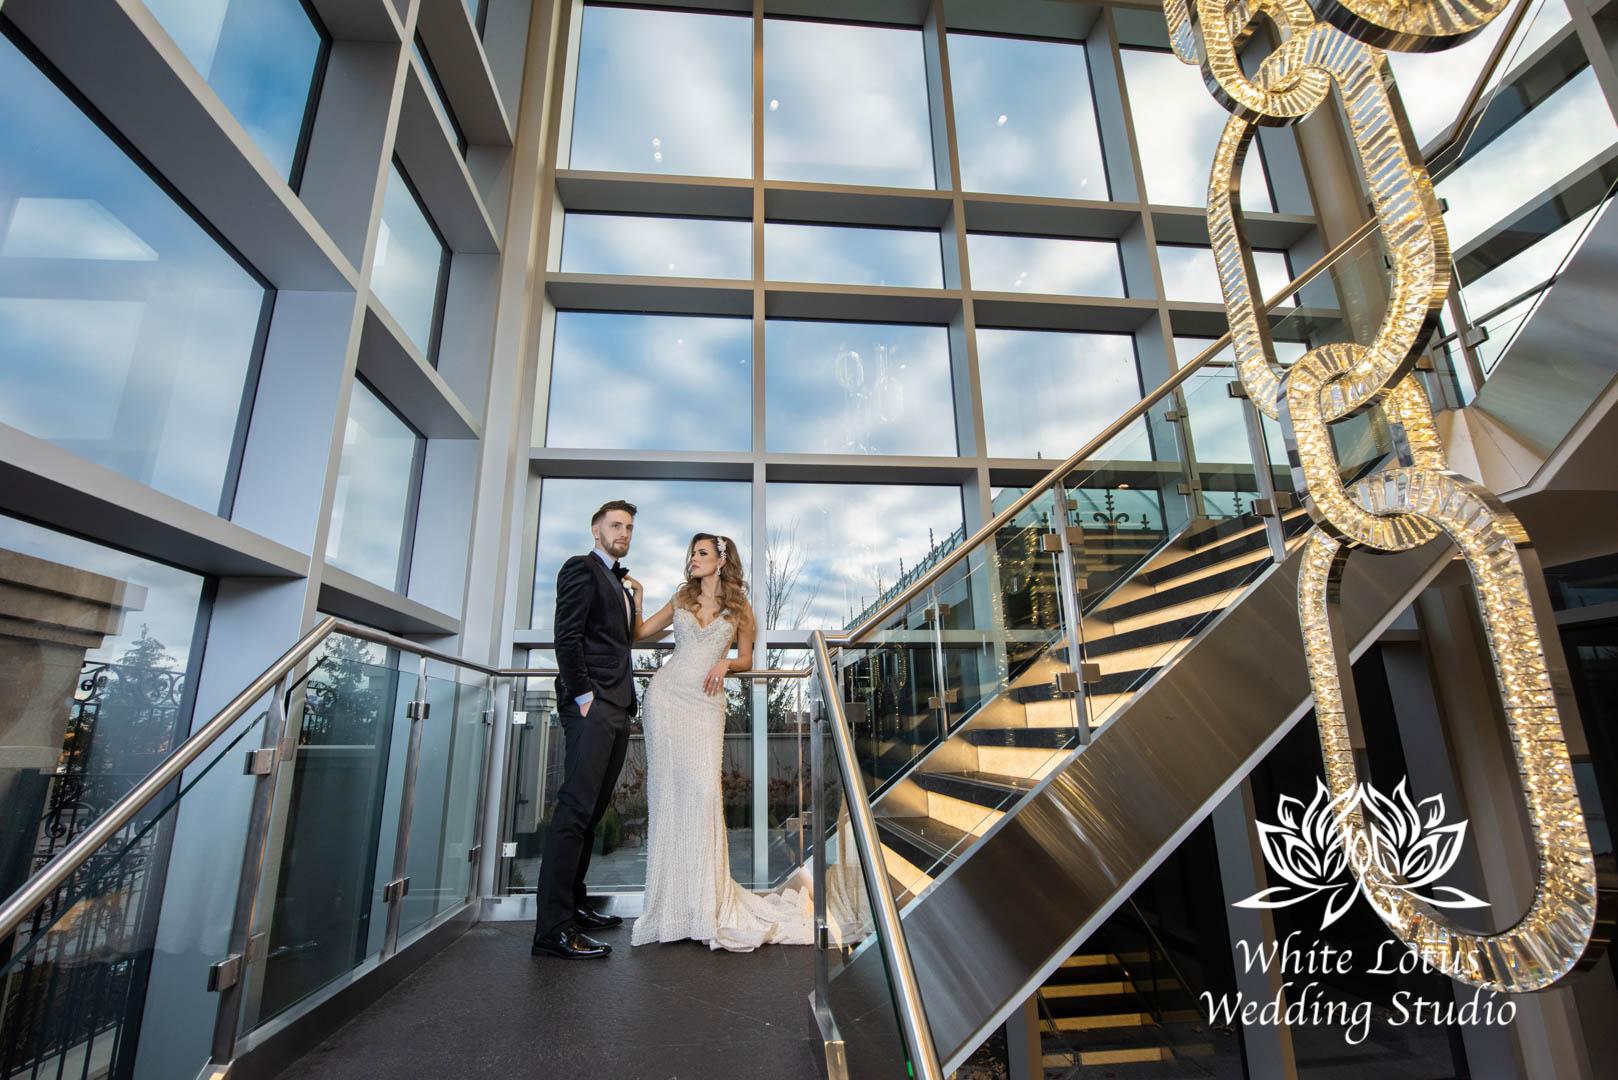 125- GLAM WINTERLUXE WEDDING INSPIRATION